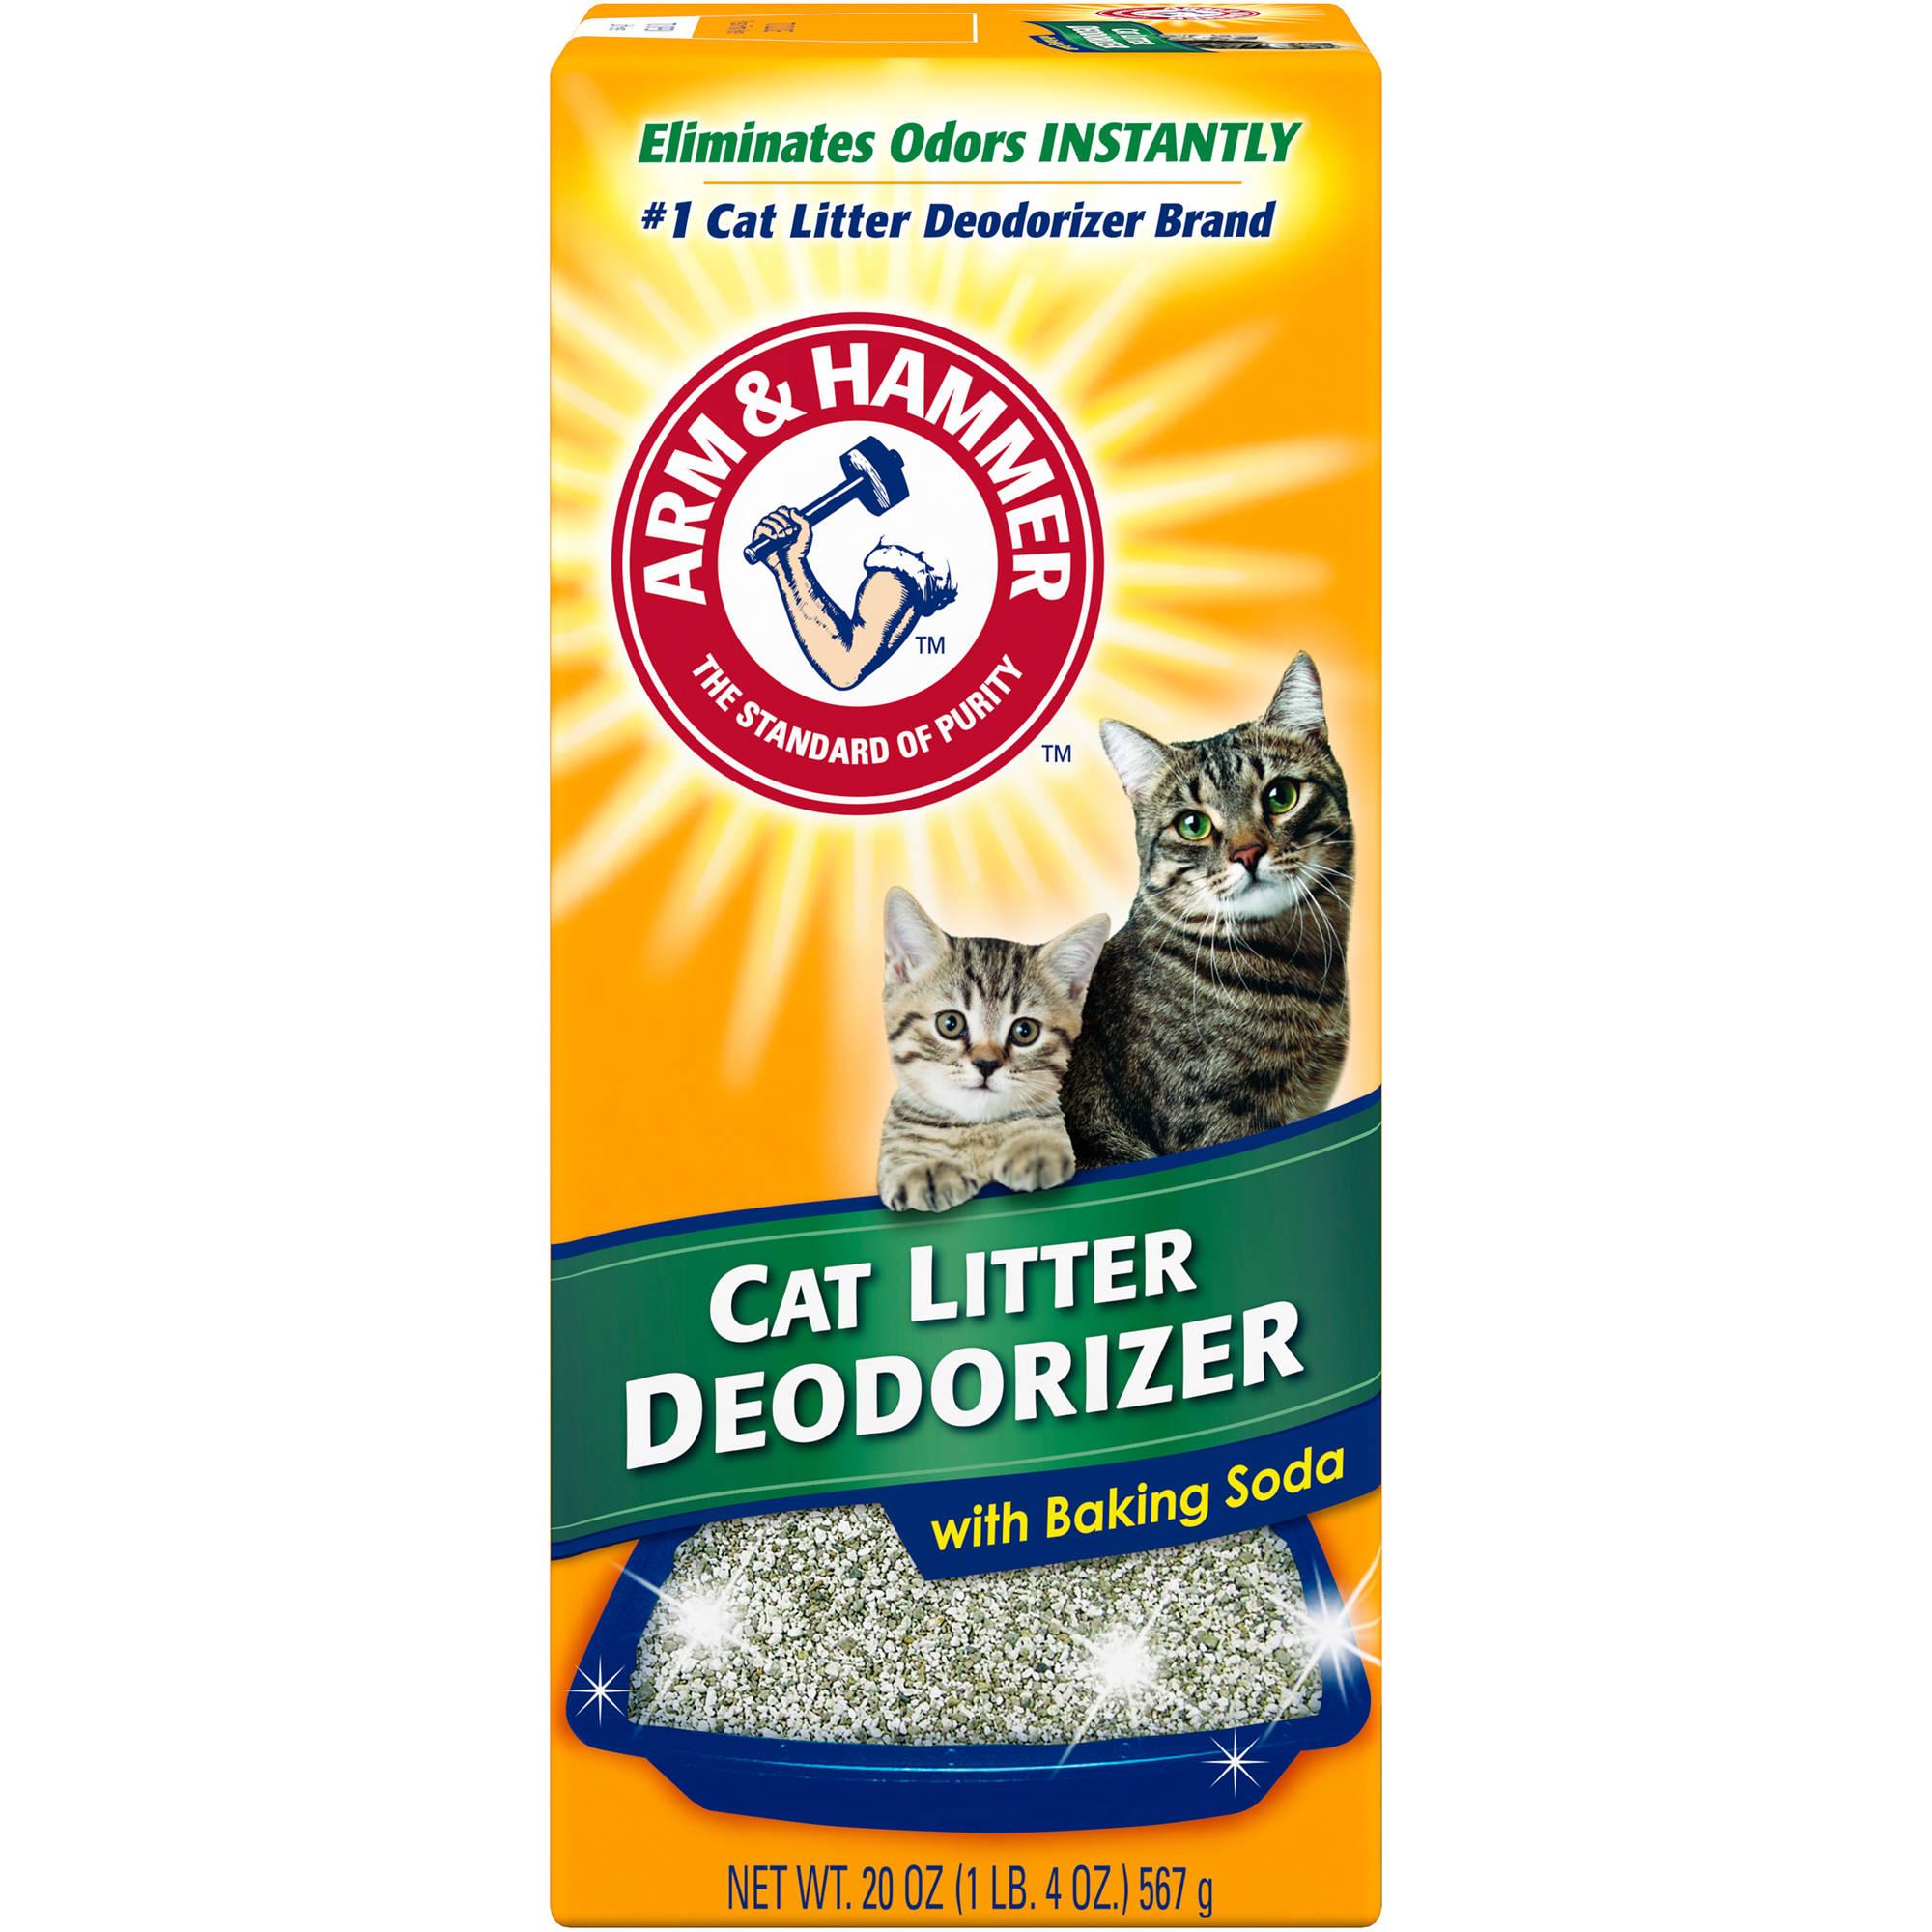 ARM & HAMMER Cat Litter Deodorizer Powder 20oz